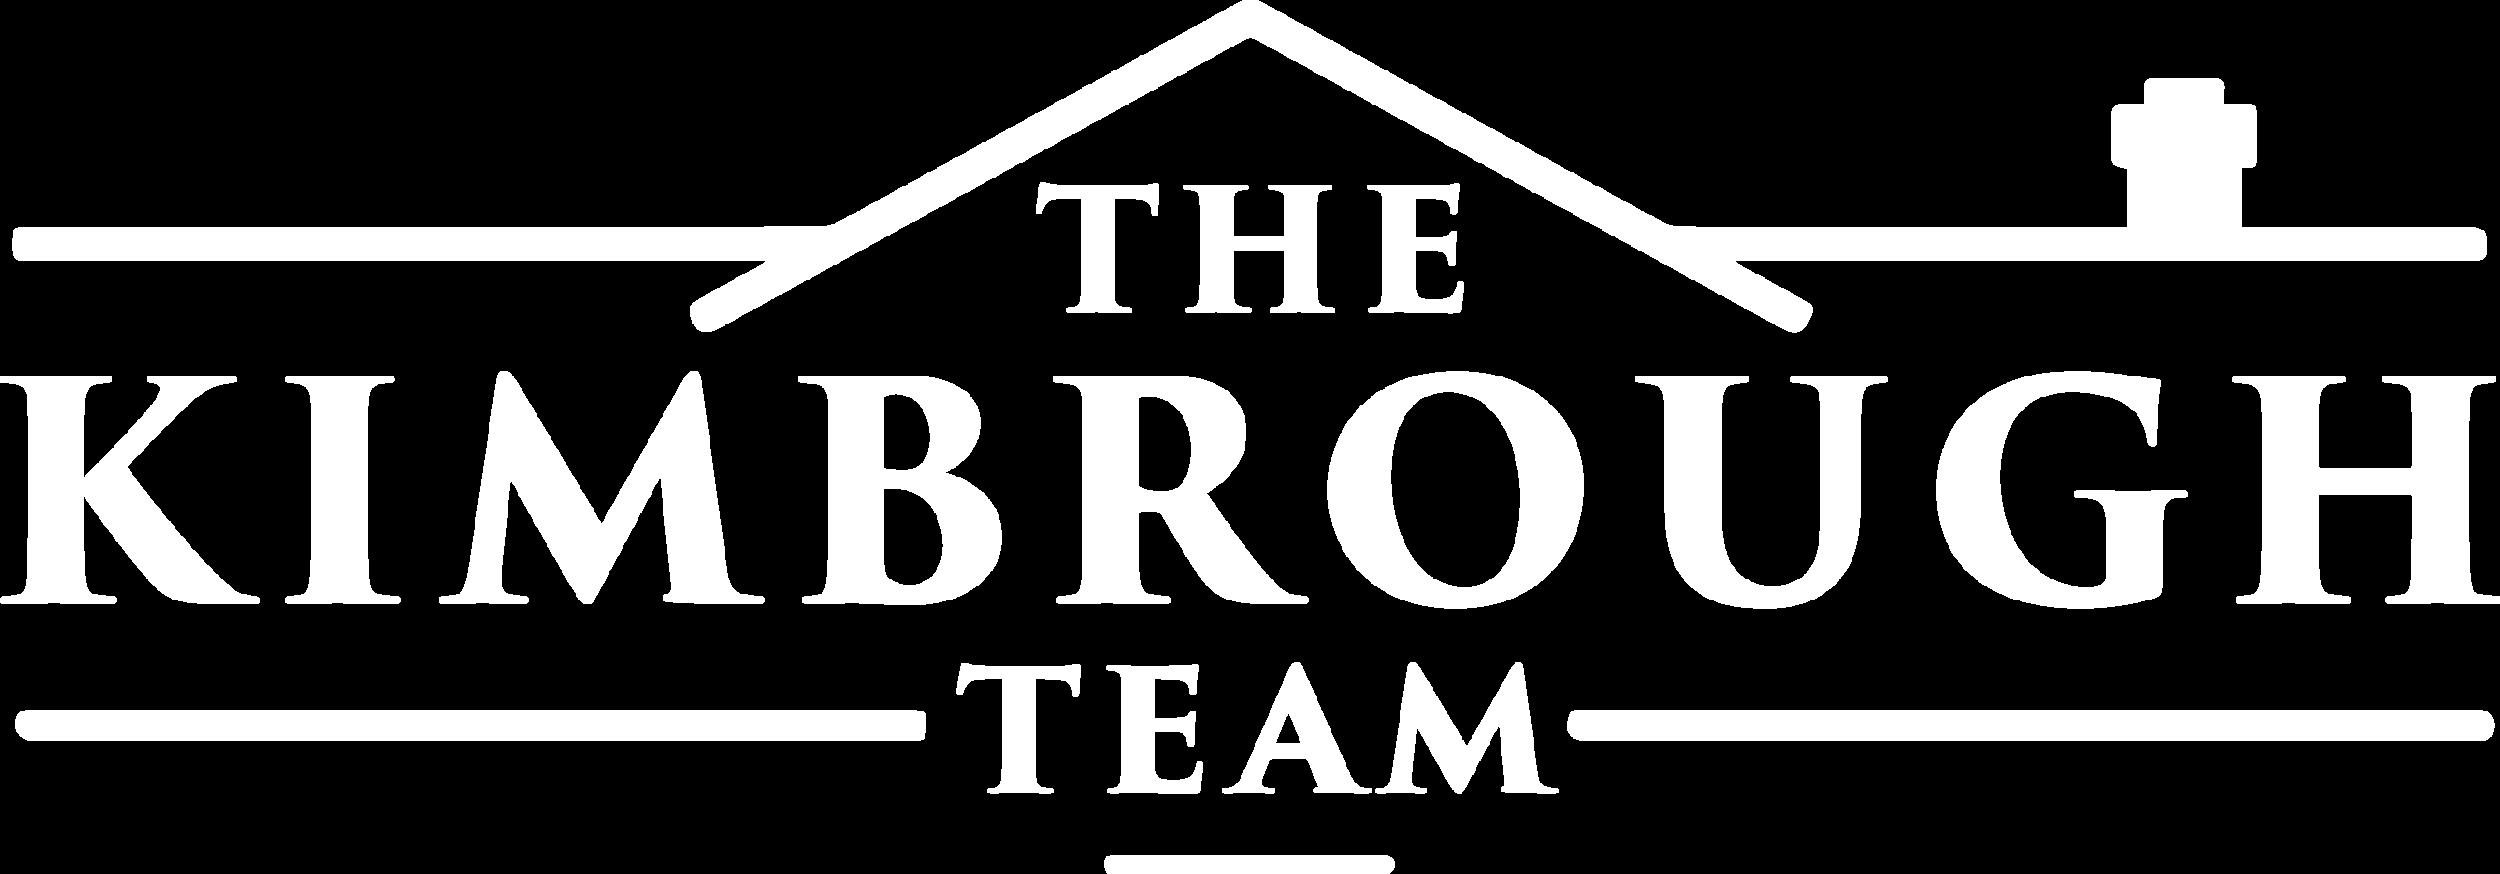 Kimbrough_Team_Logo_White_BILLBOARD.png